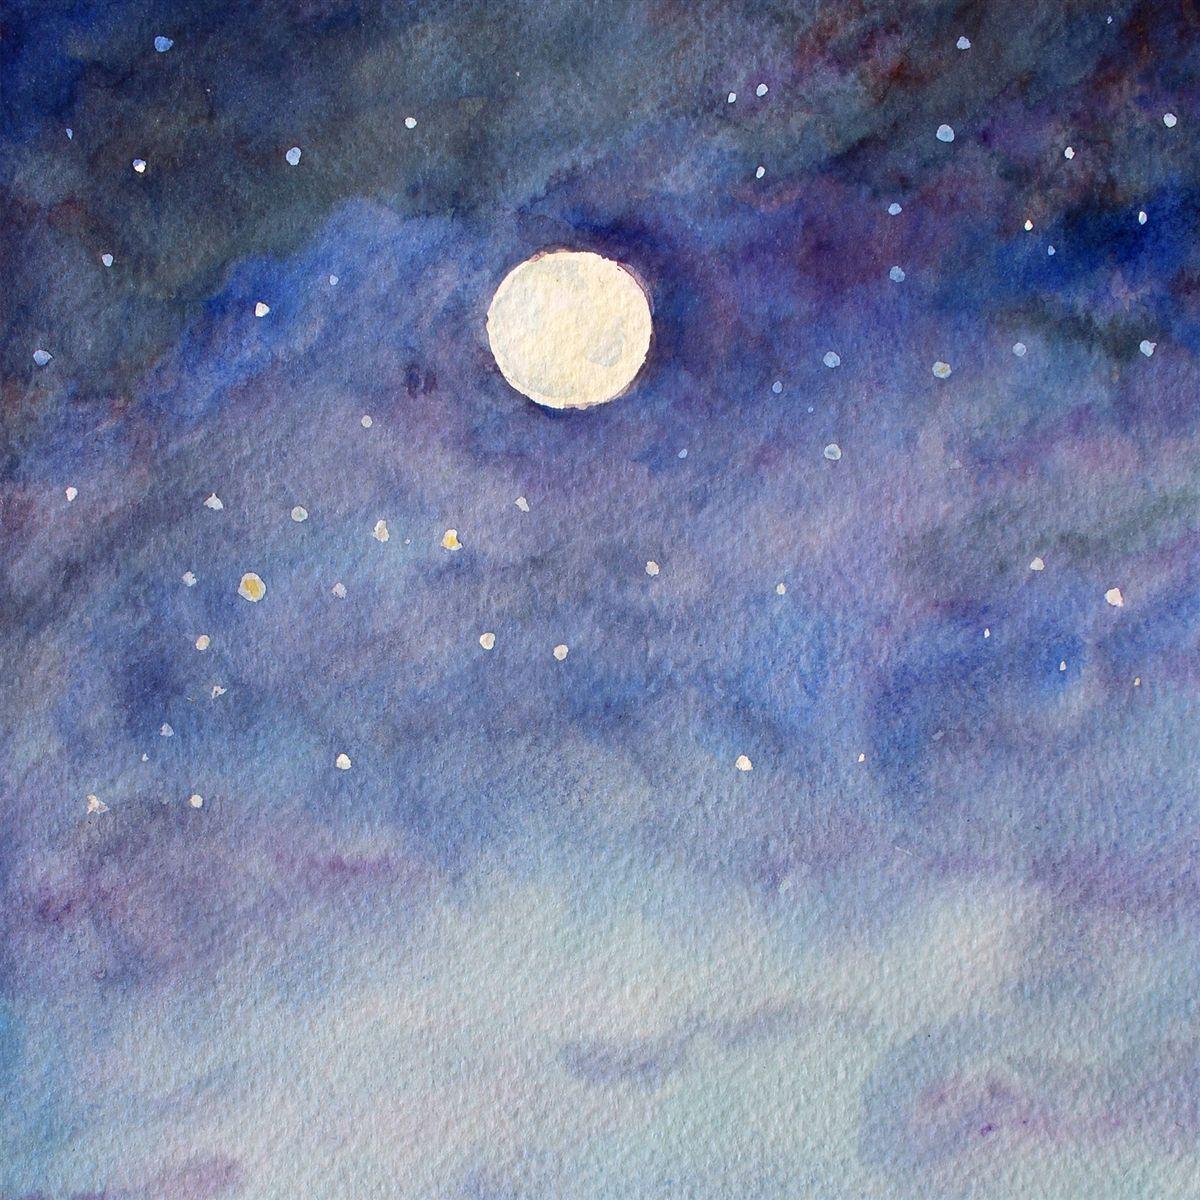 Картинки звездного неба рисовать